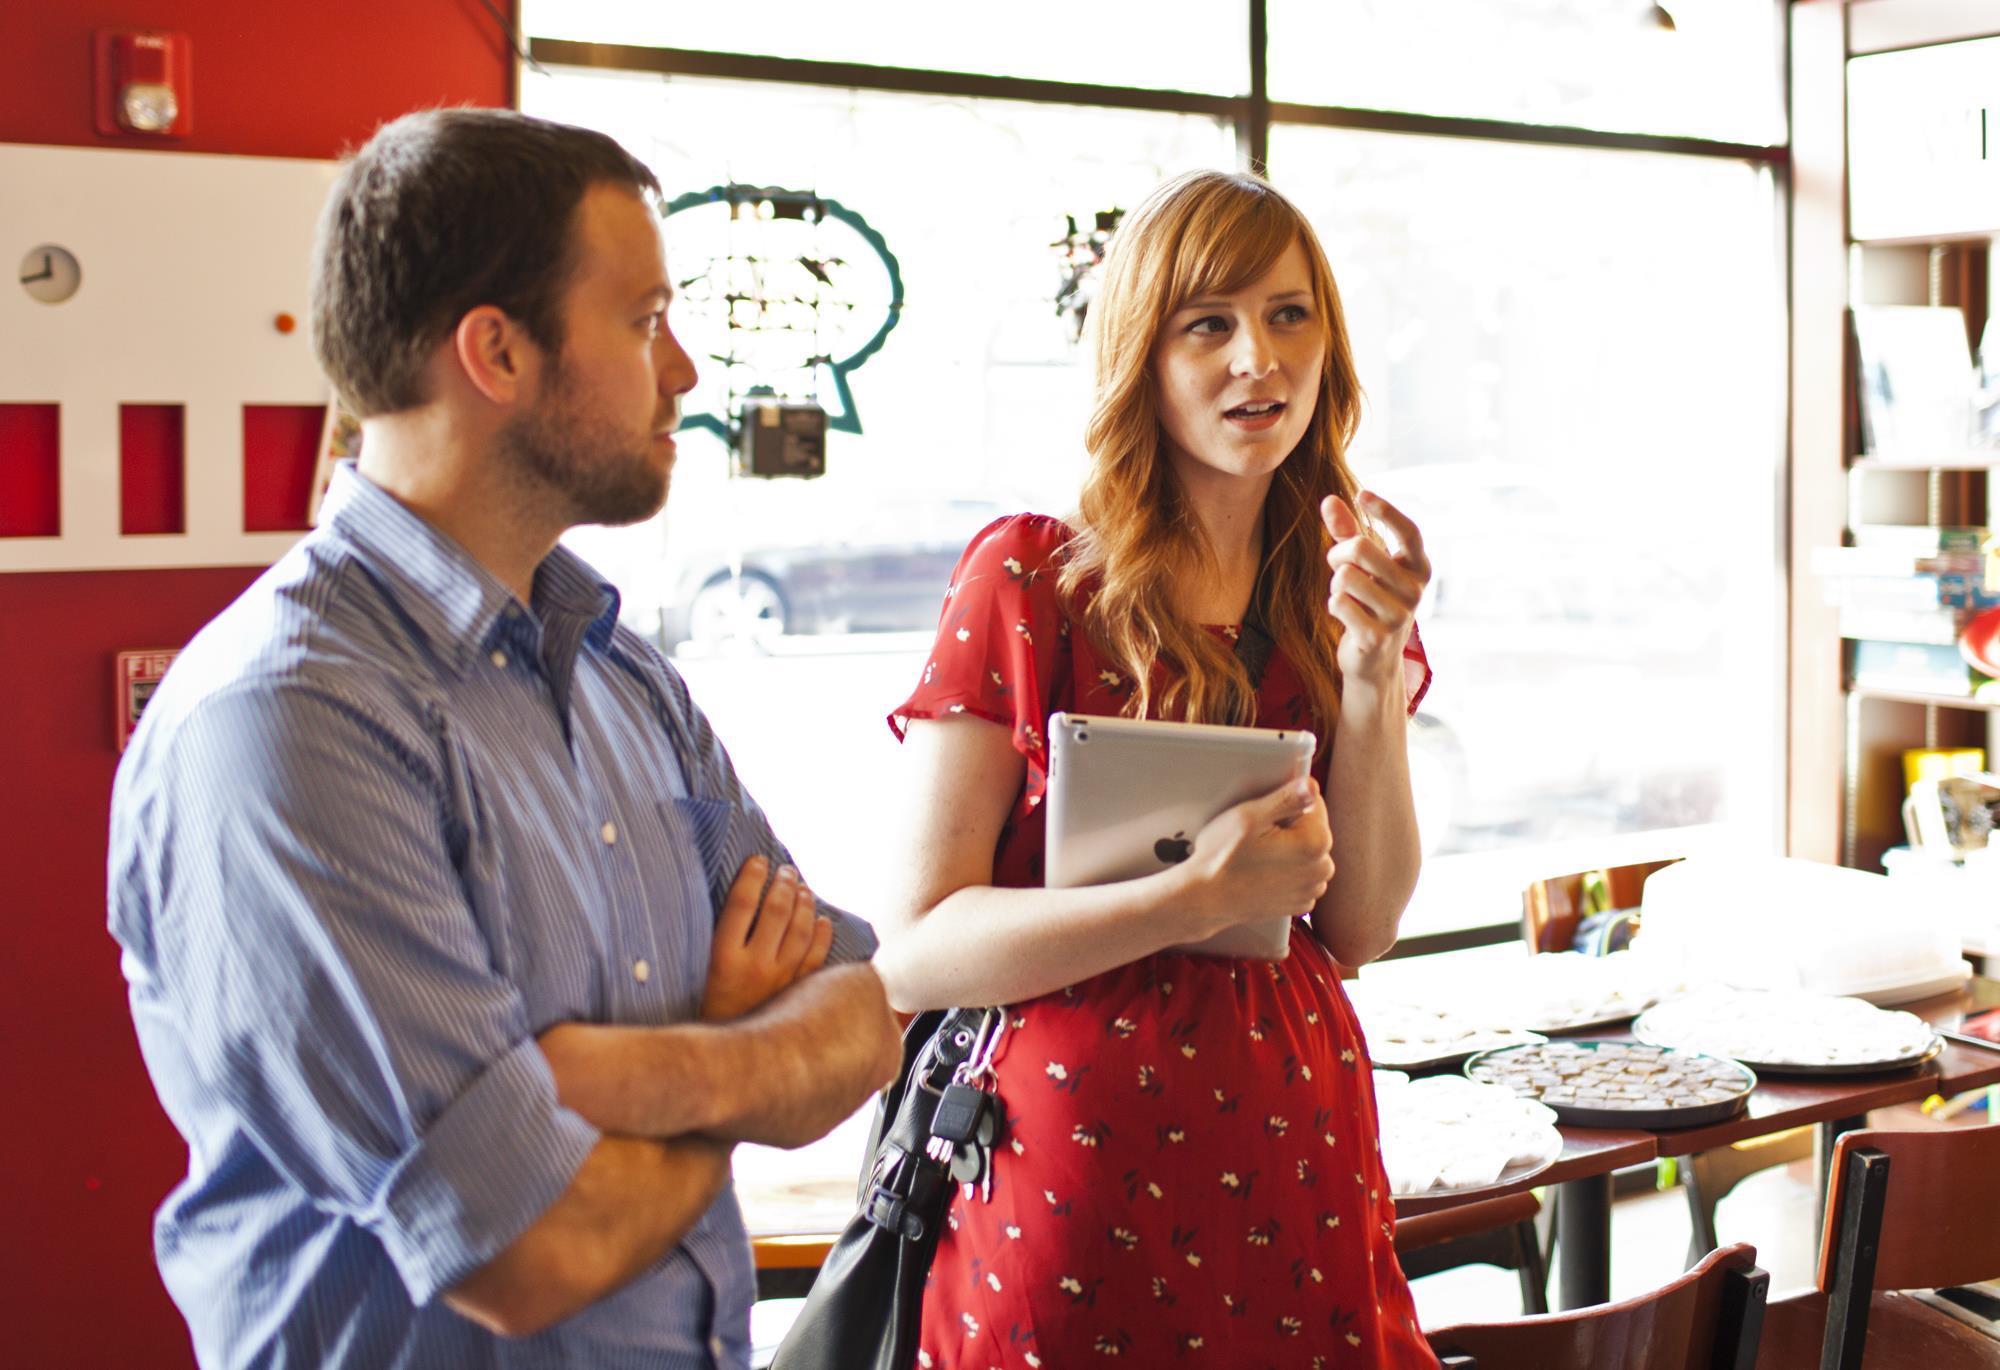 Amanda Morrow conversing with someone at a coffee shop.